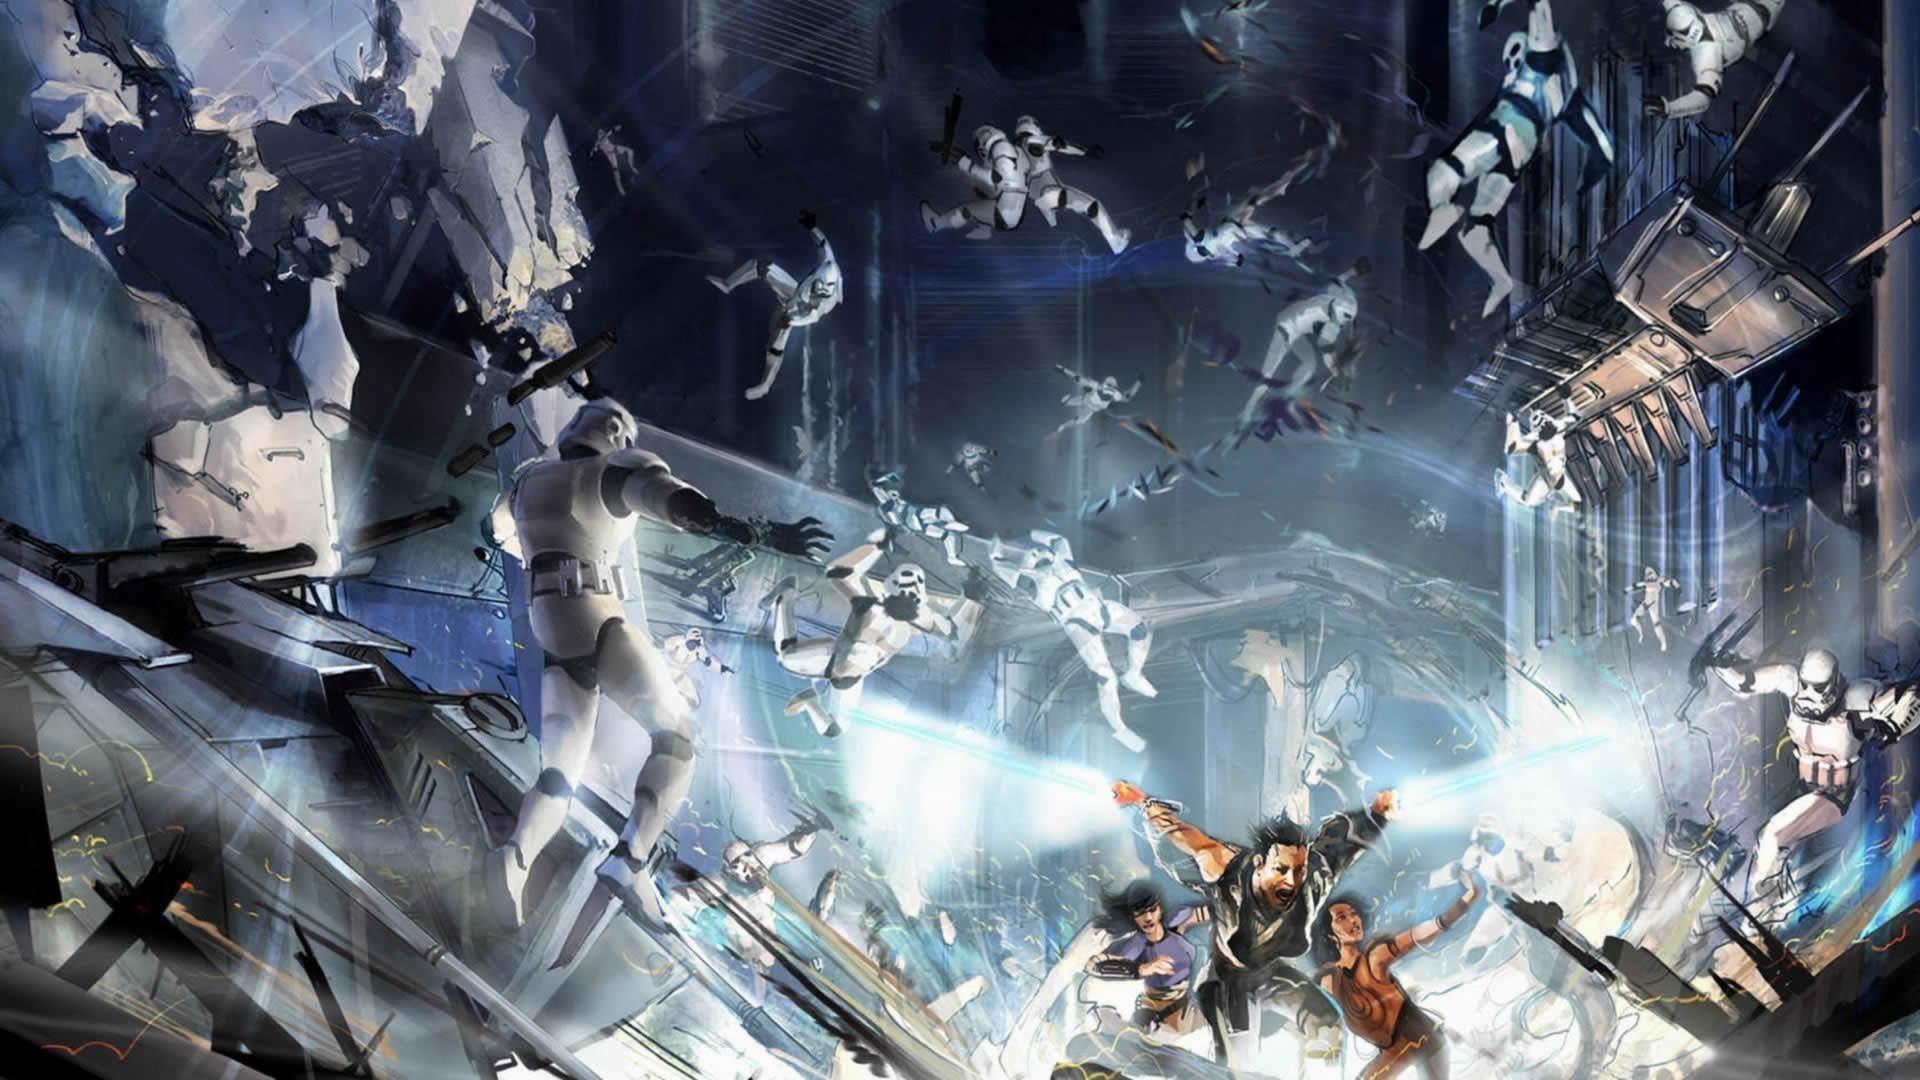 wallpaper.wiki-Badass-Star-Wars-Wallpapers-hd-PIC-